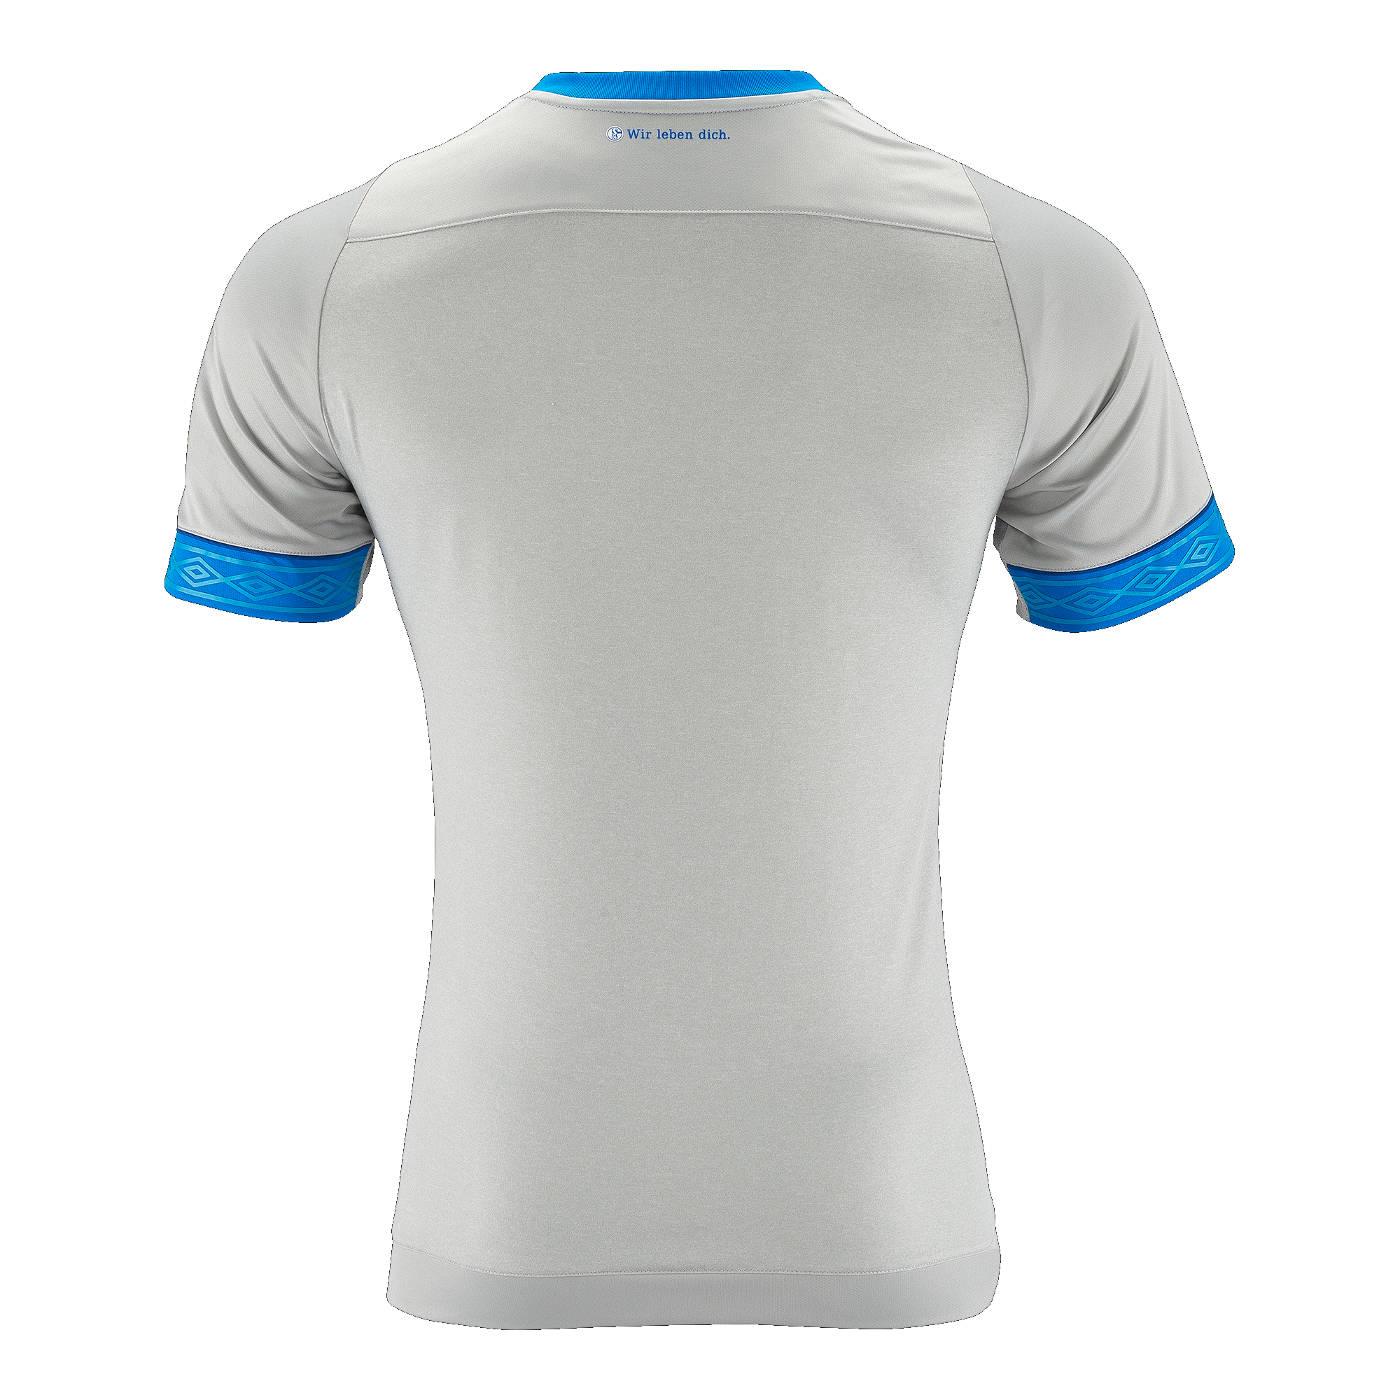 Maglie Schalke 04 2018-2019, l'esordio di Umbro a Gelsenkirchen